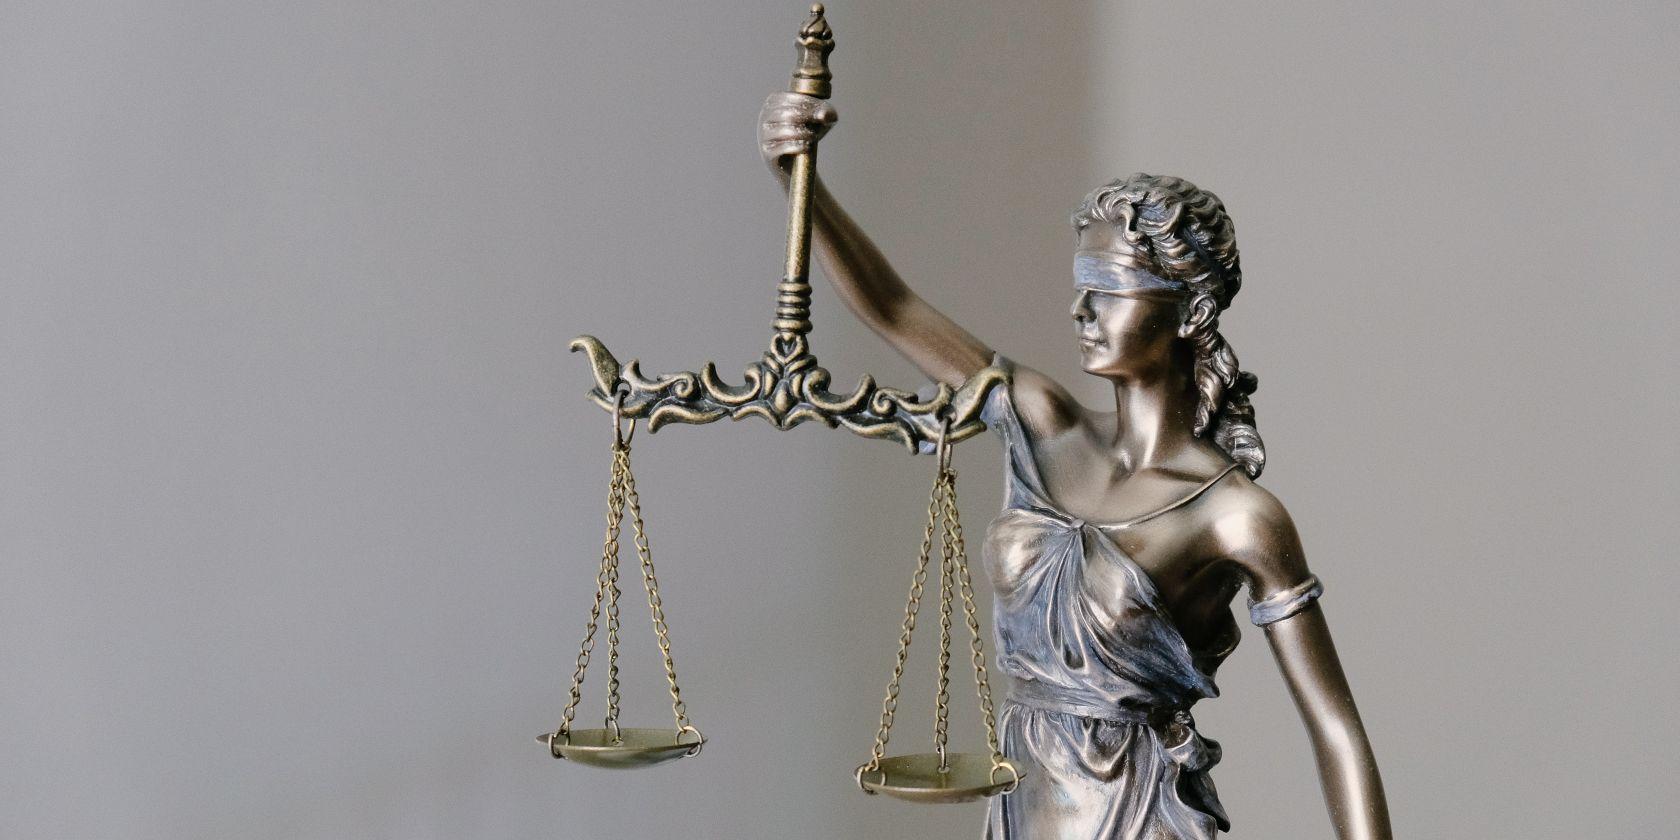 tingey-injury-law-firm-ycdpu73kgsc-unsplash